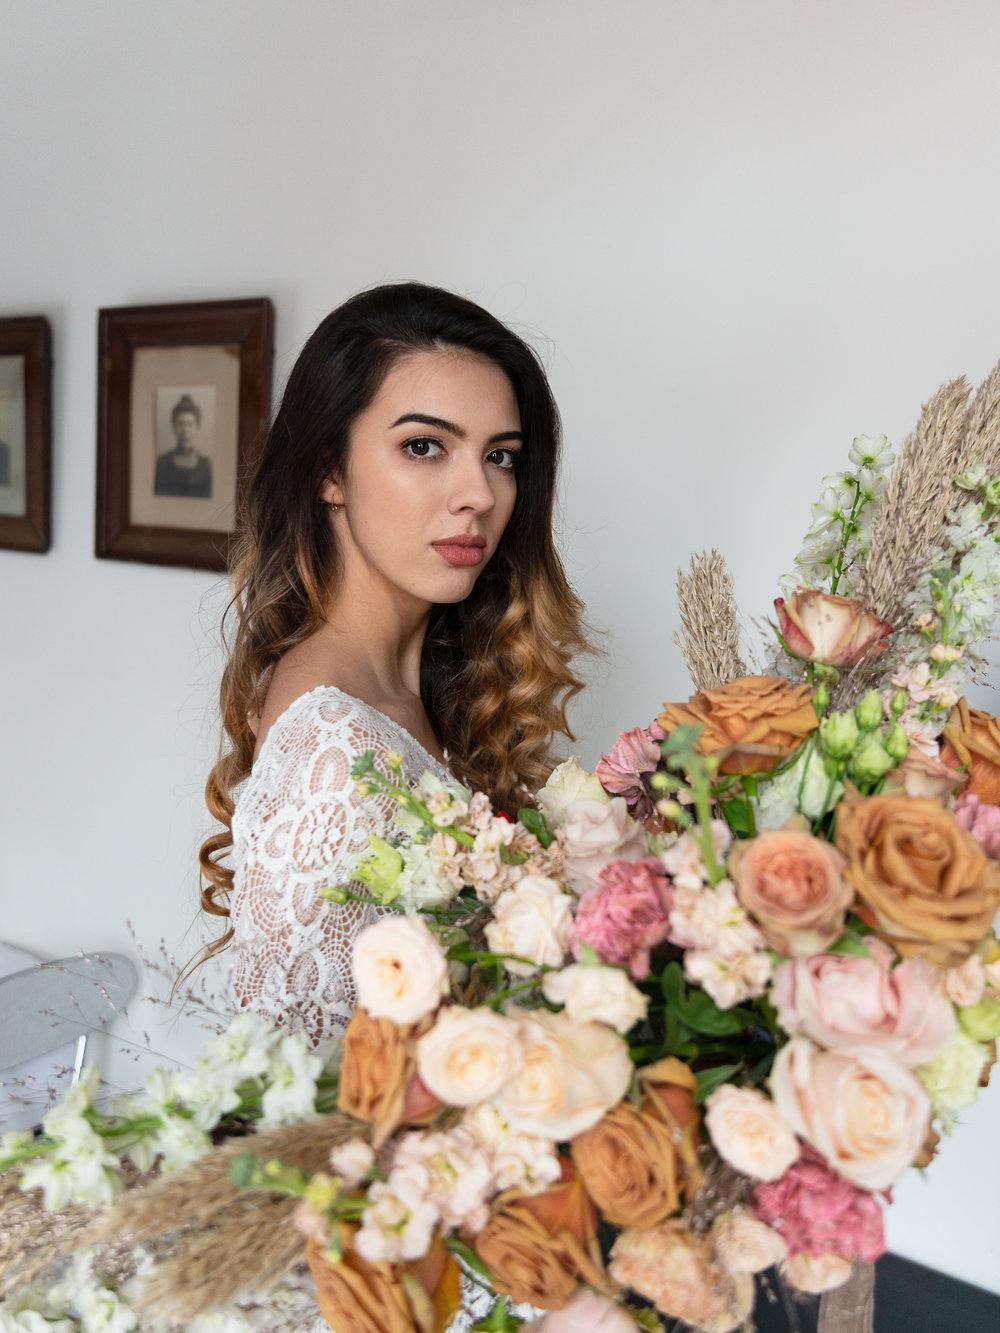 styled-bridal-13.jpg